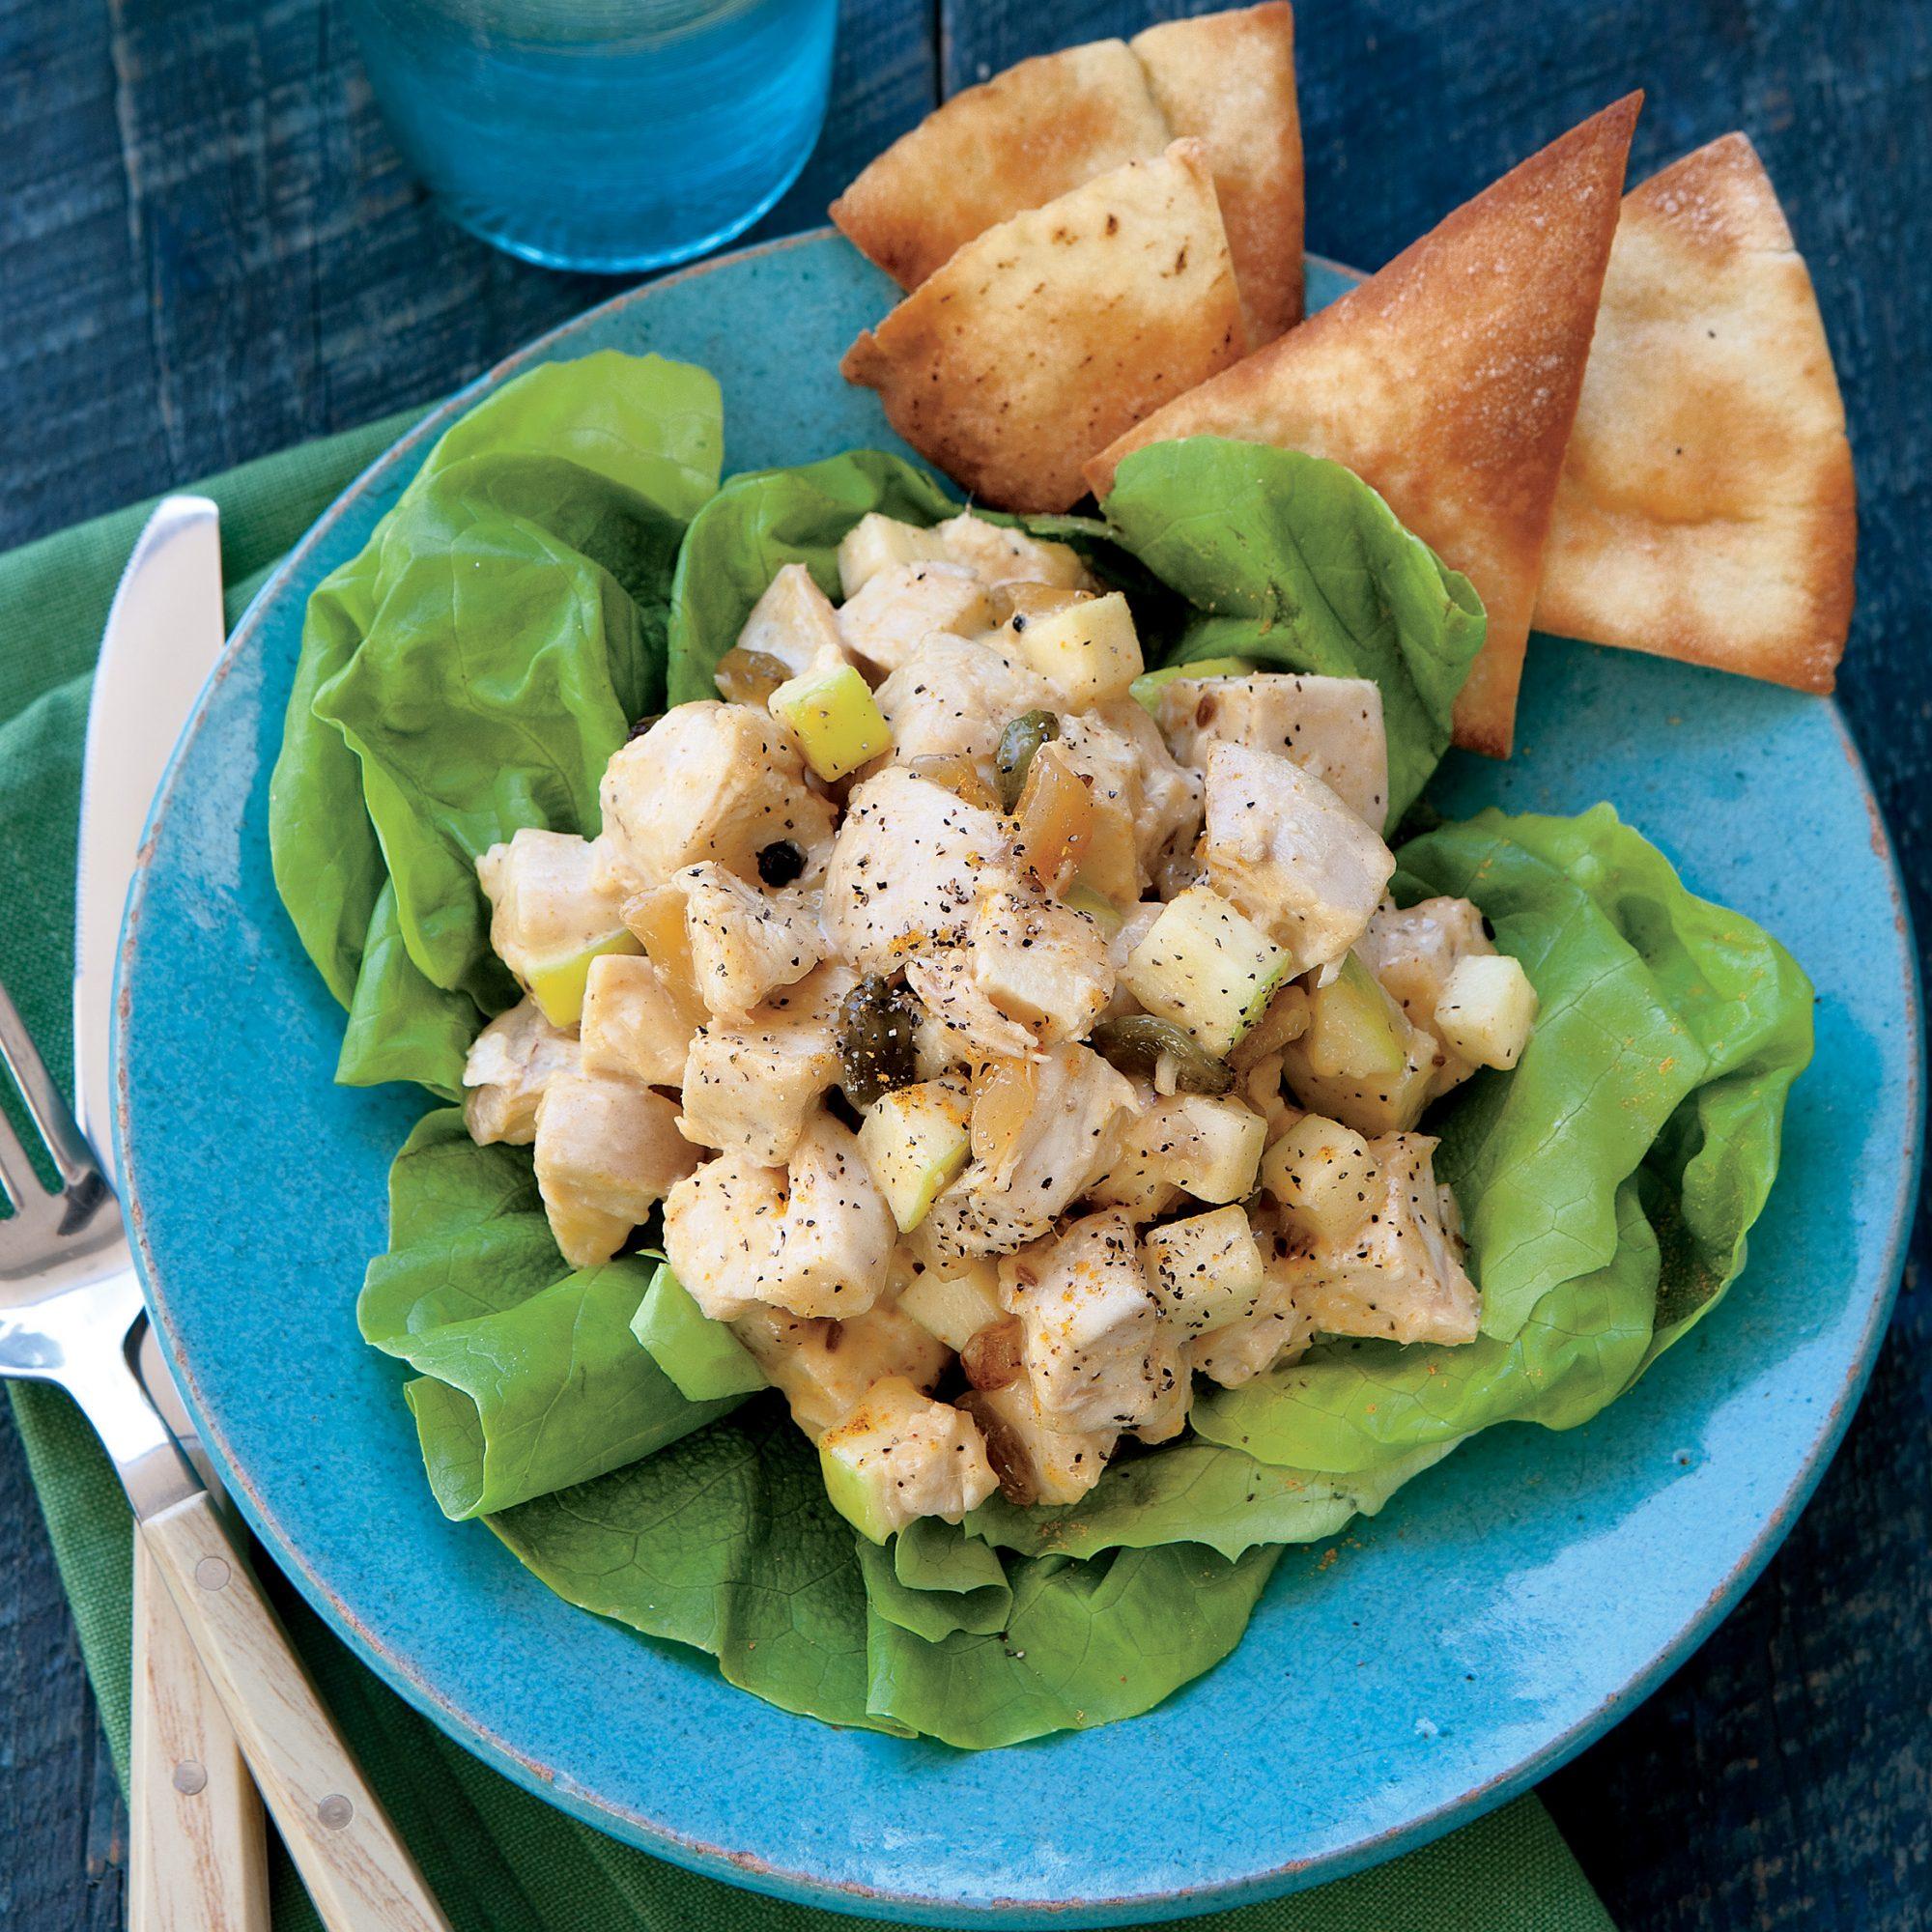 Coronation Chicken Salad with Pita Chips